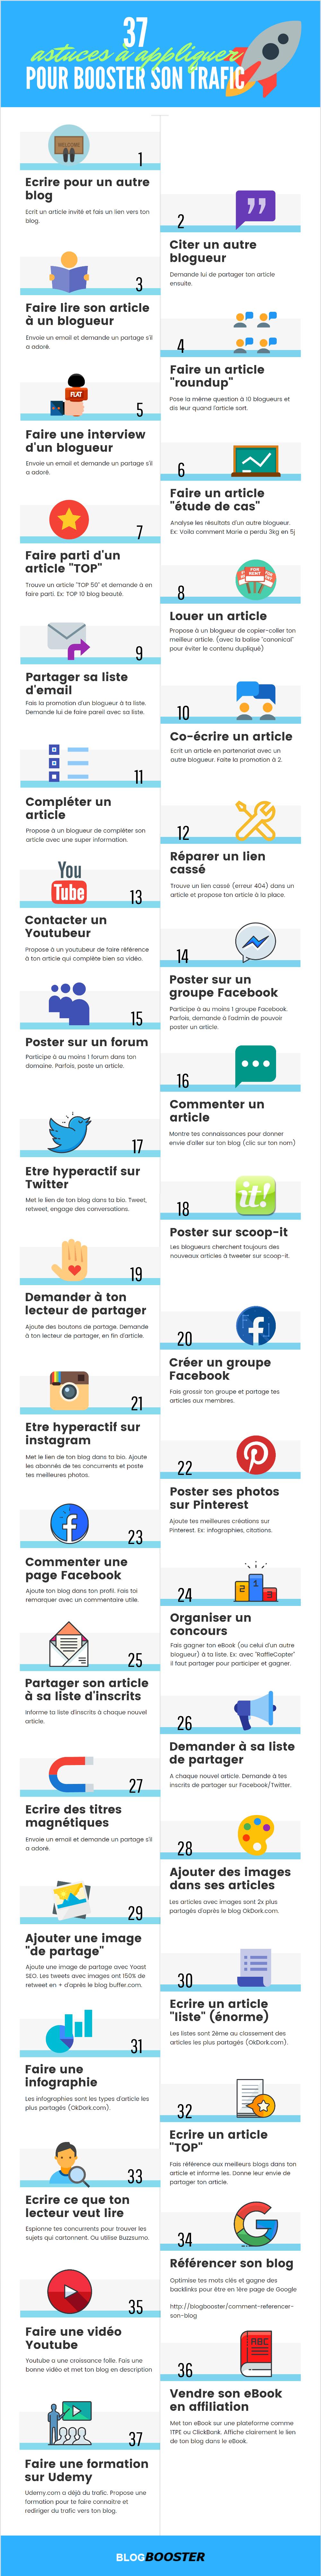 37 astuces trafic blog (infographie)